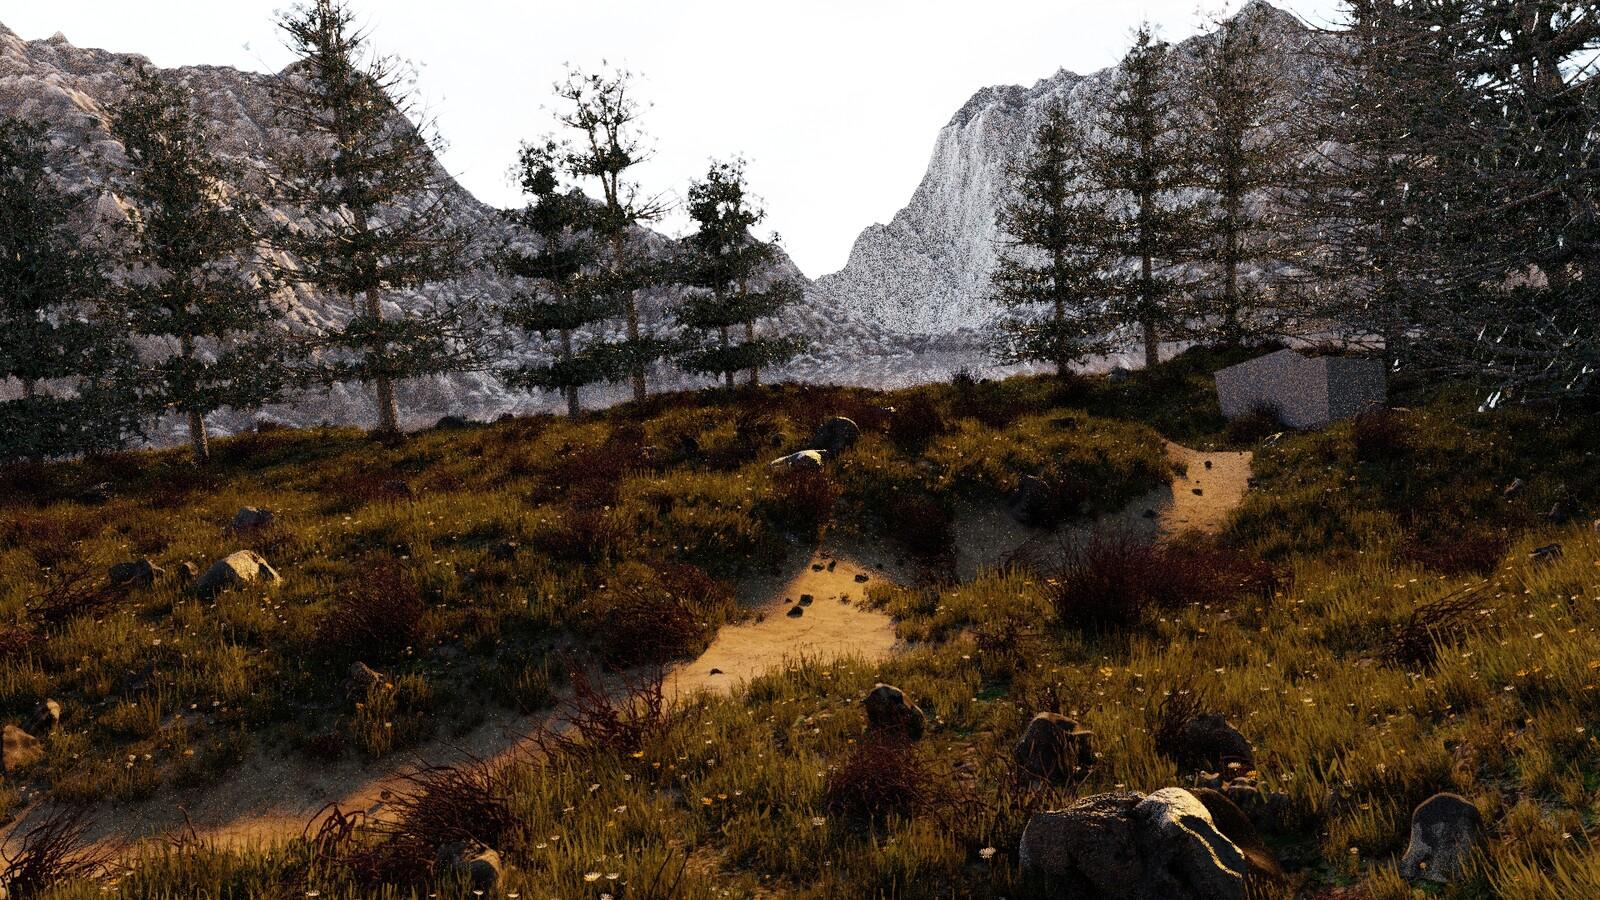 I added back the rocks and those purple-ish bushes.